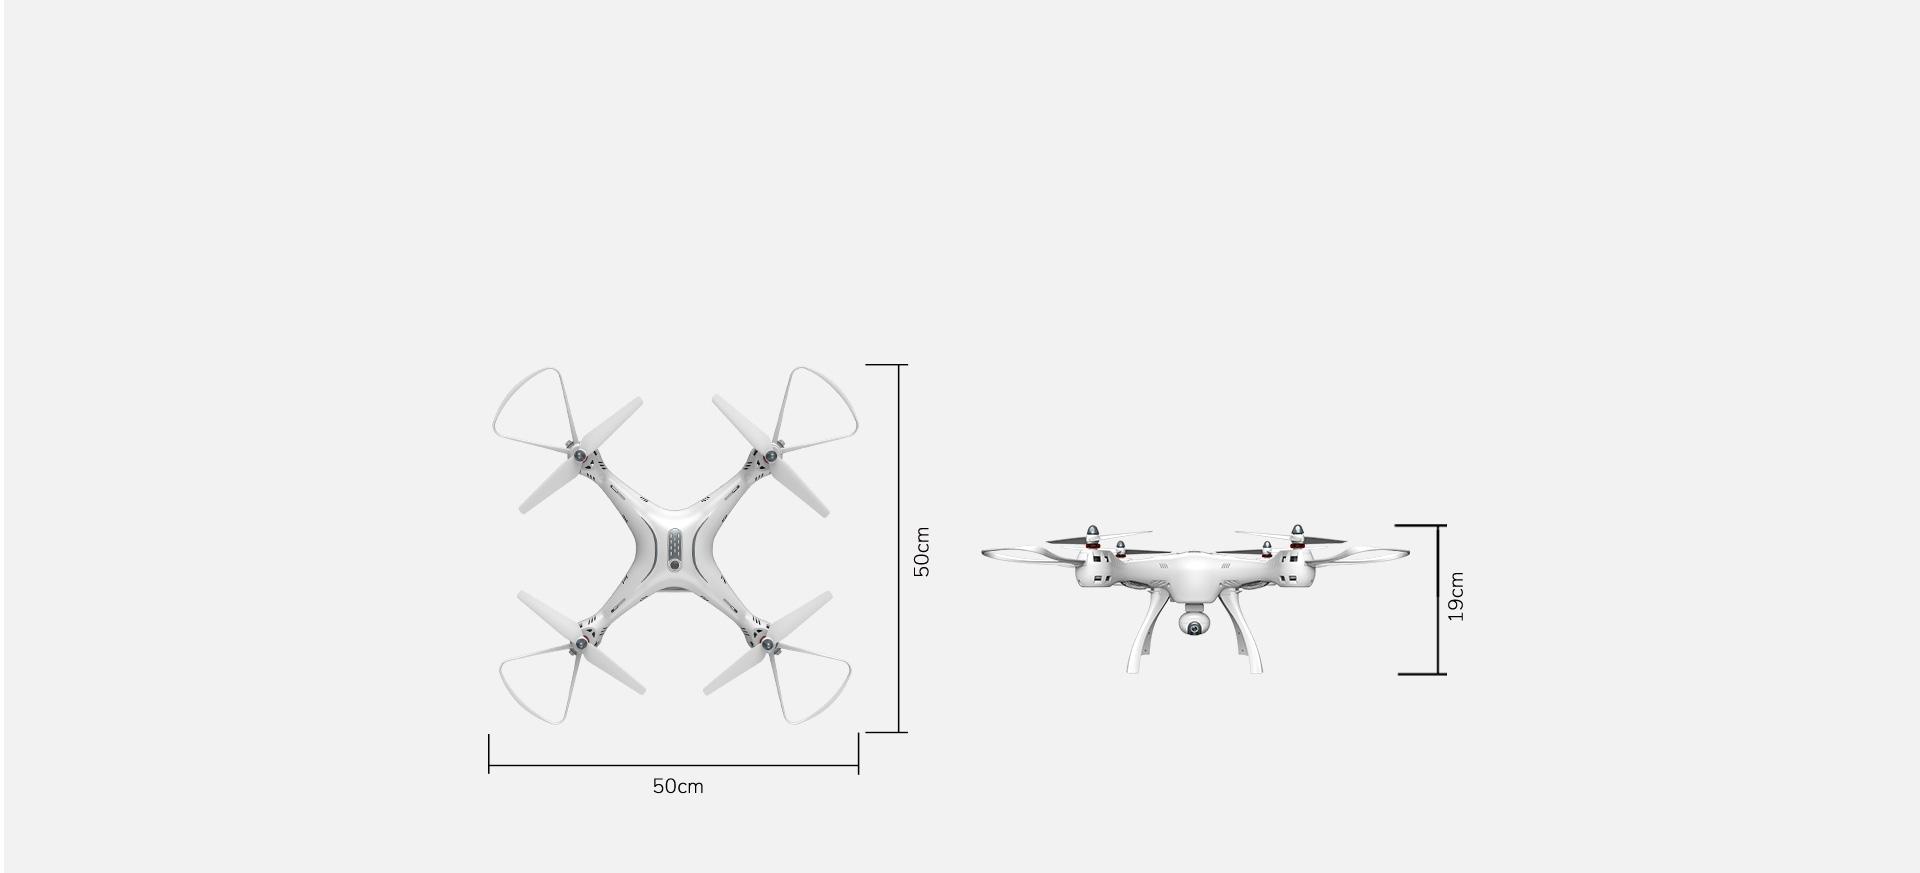 Rc Gps Wi Fi Fpv Camera Drone